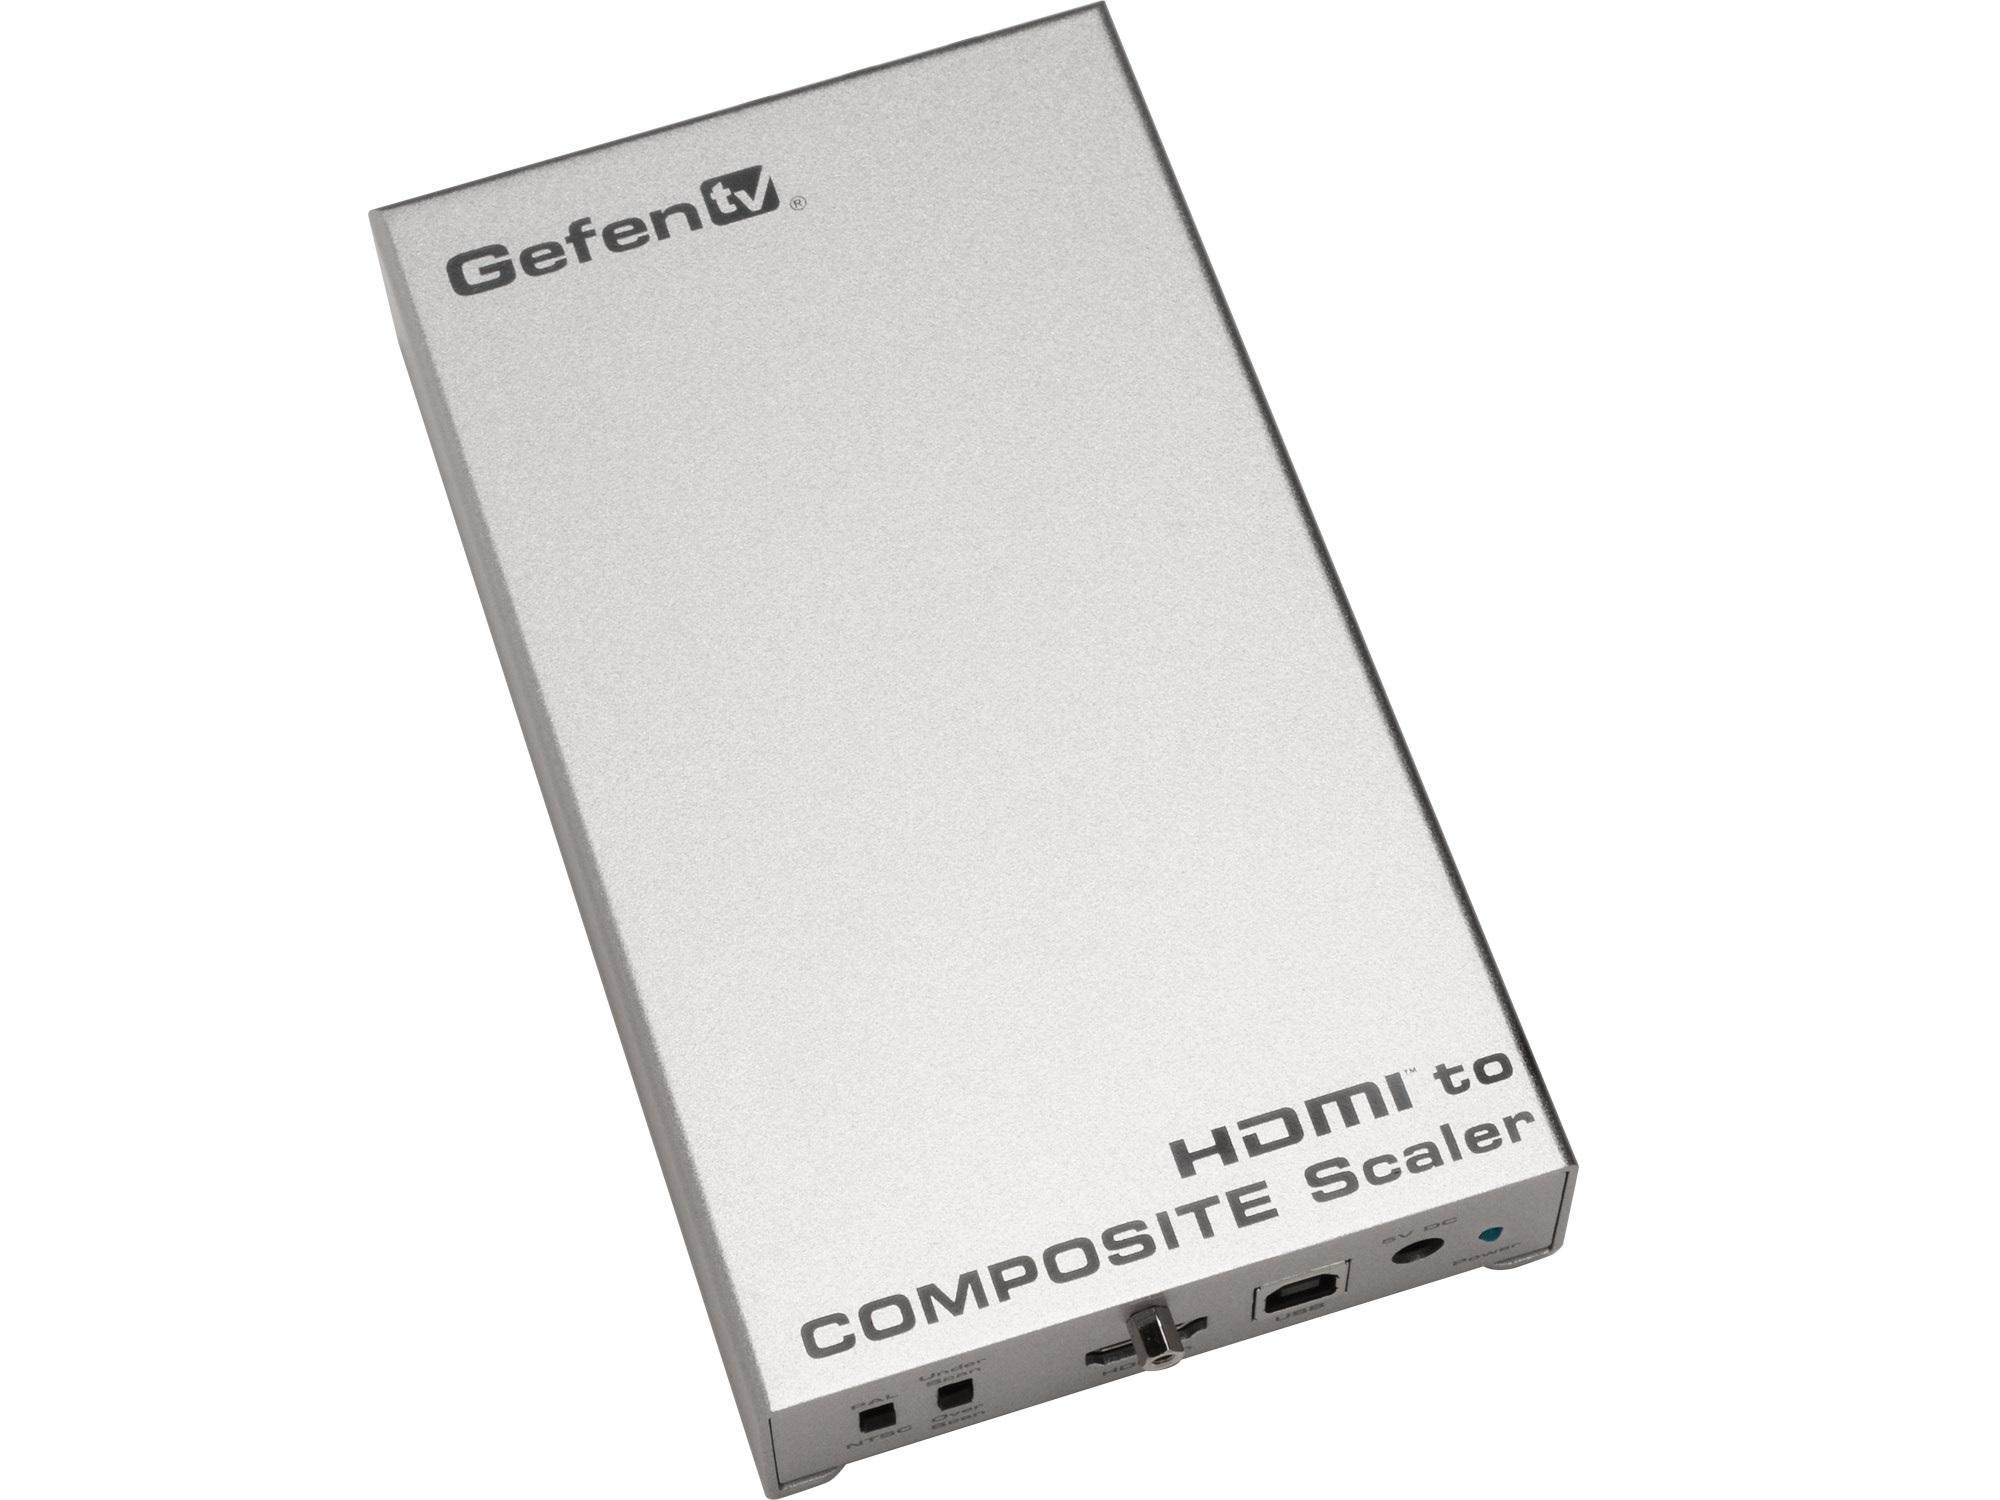 GTV-HDMI-2-COMPSVIDSN HDMI to Composite / S-Video Scaler by Gefen